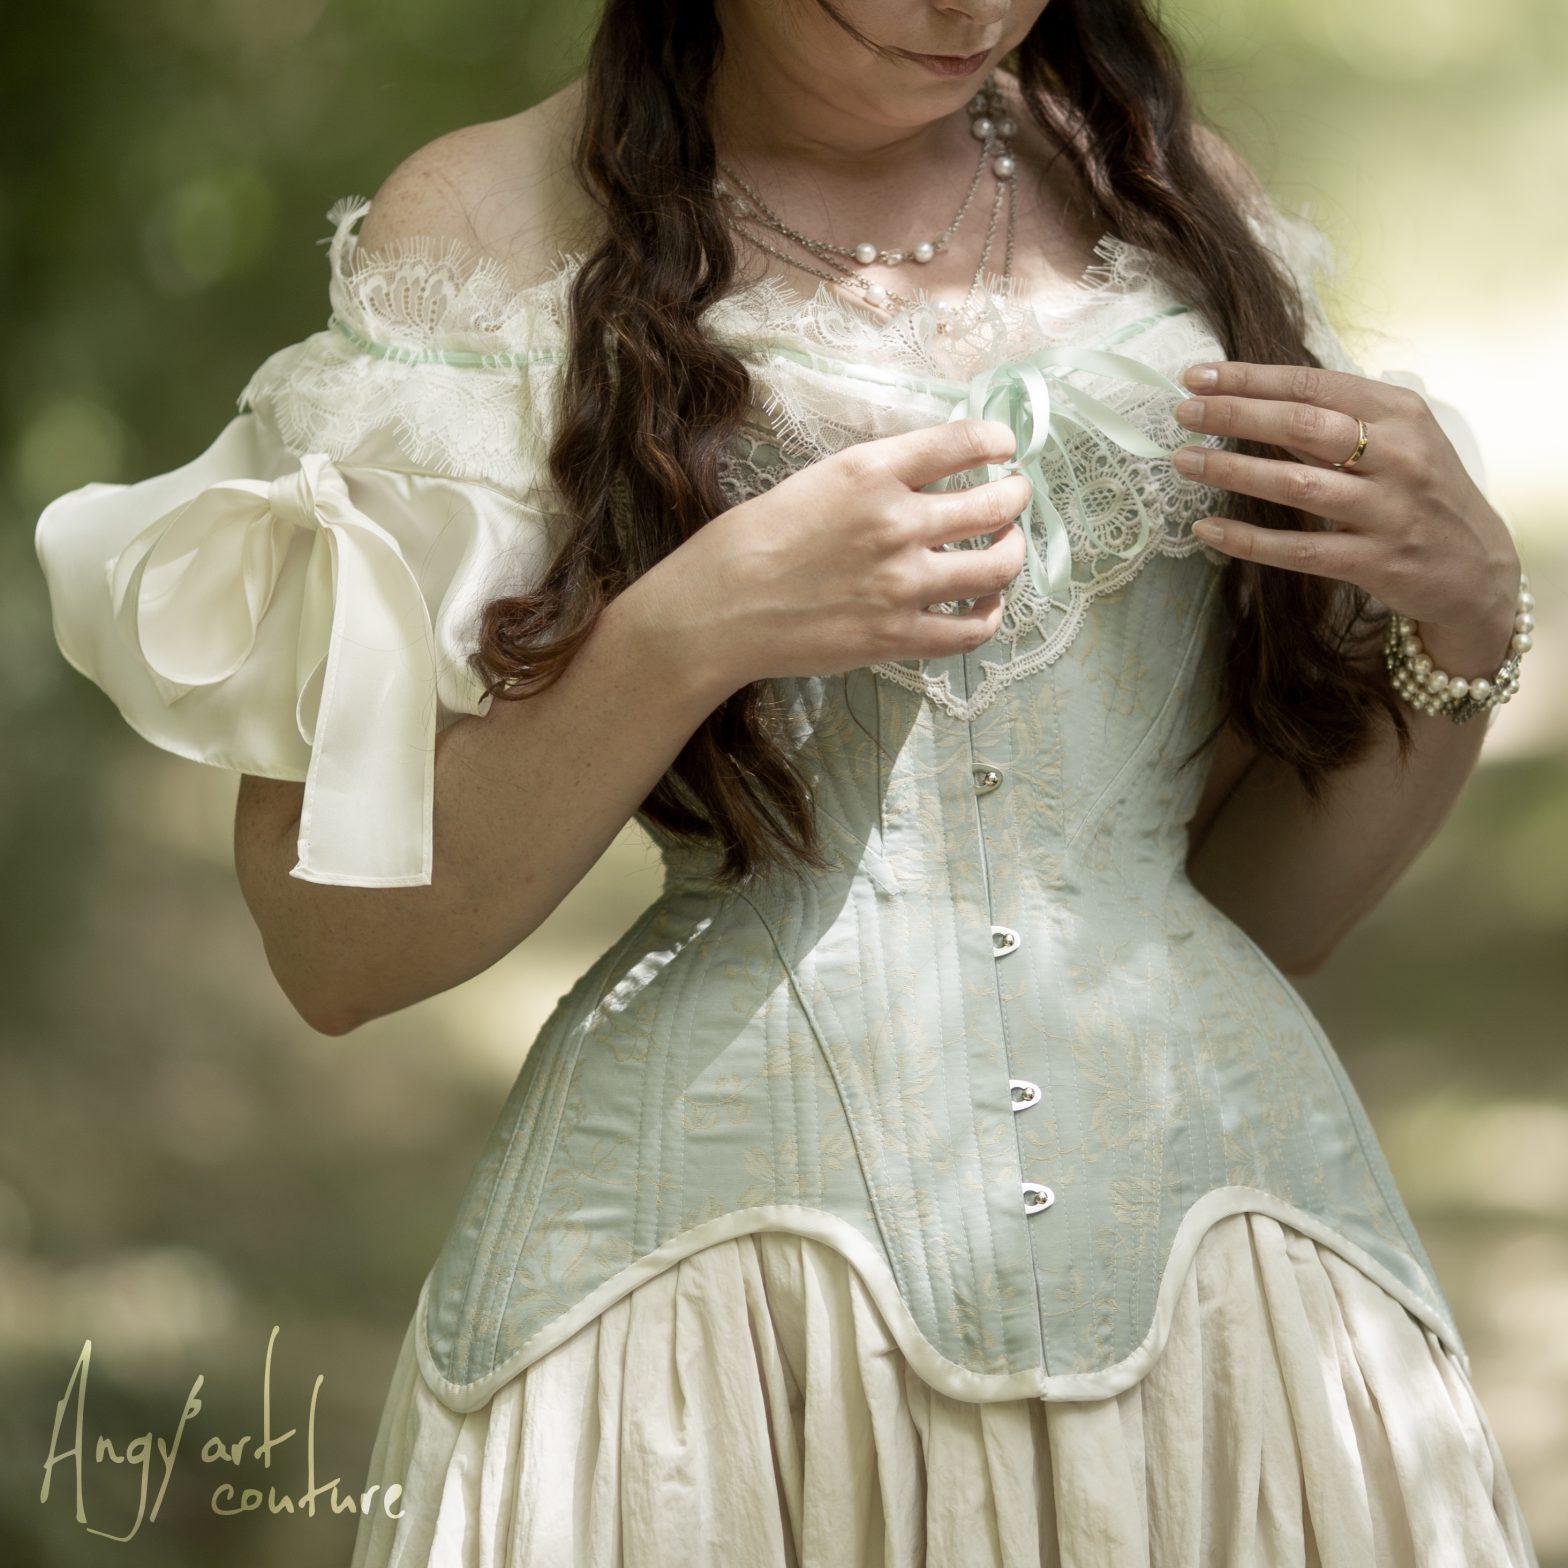 Corset 19e siècle - Angy'art couture